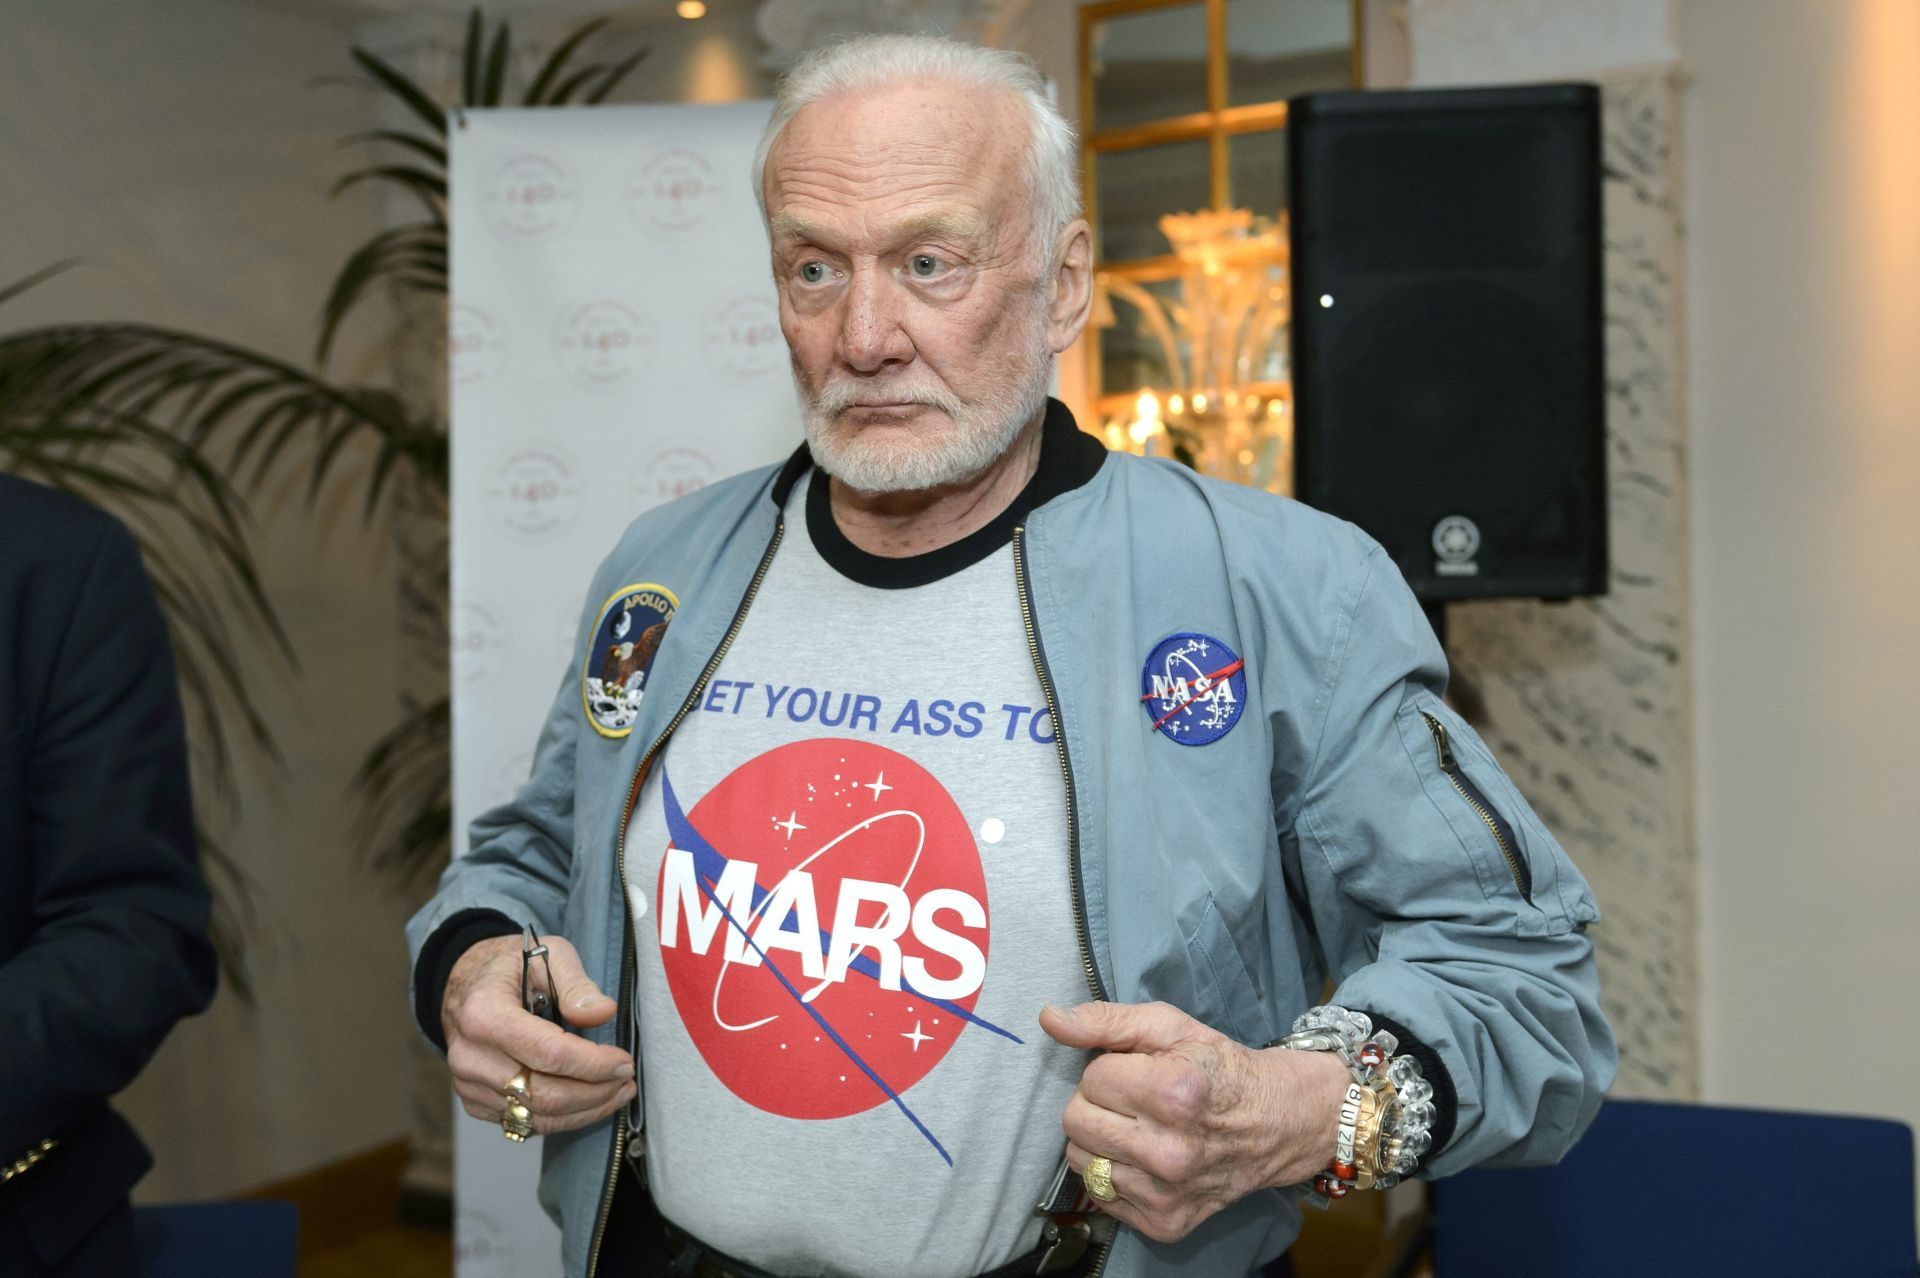 MEDICINSKI RAZLOZI: Astronaut Buzz Aldrin evakuiran s Južnog pola